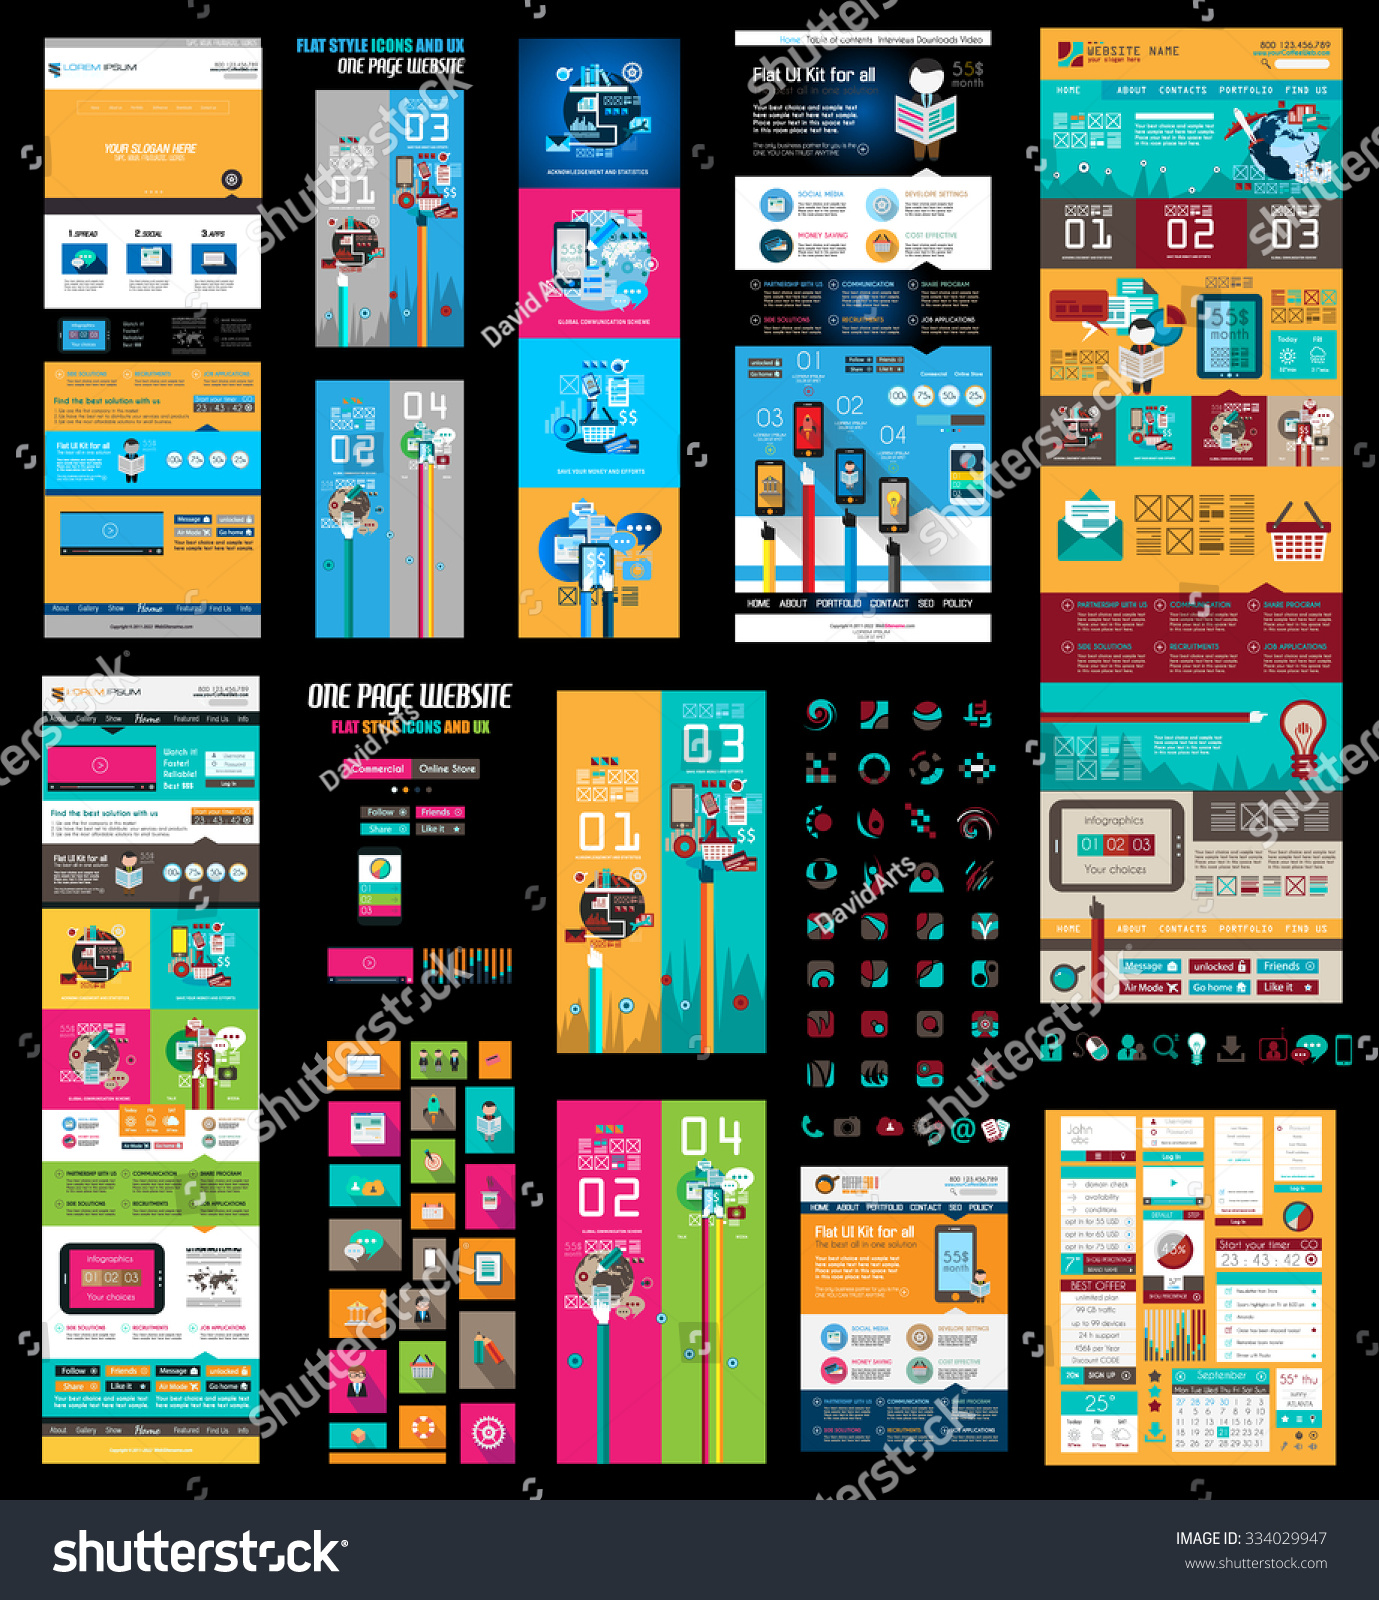 html header menu templates - mega collection of website templates web headers footers